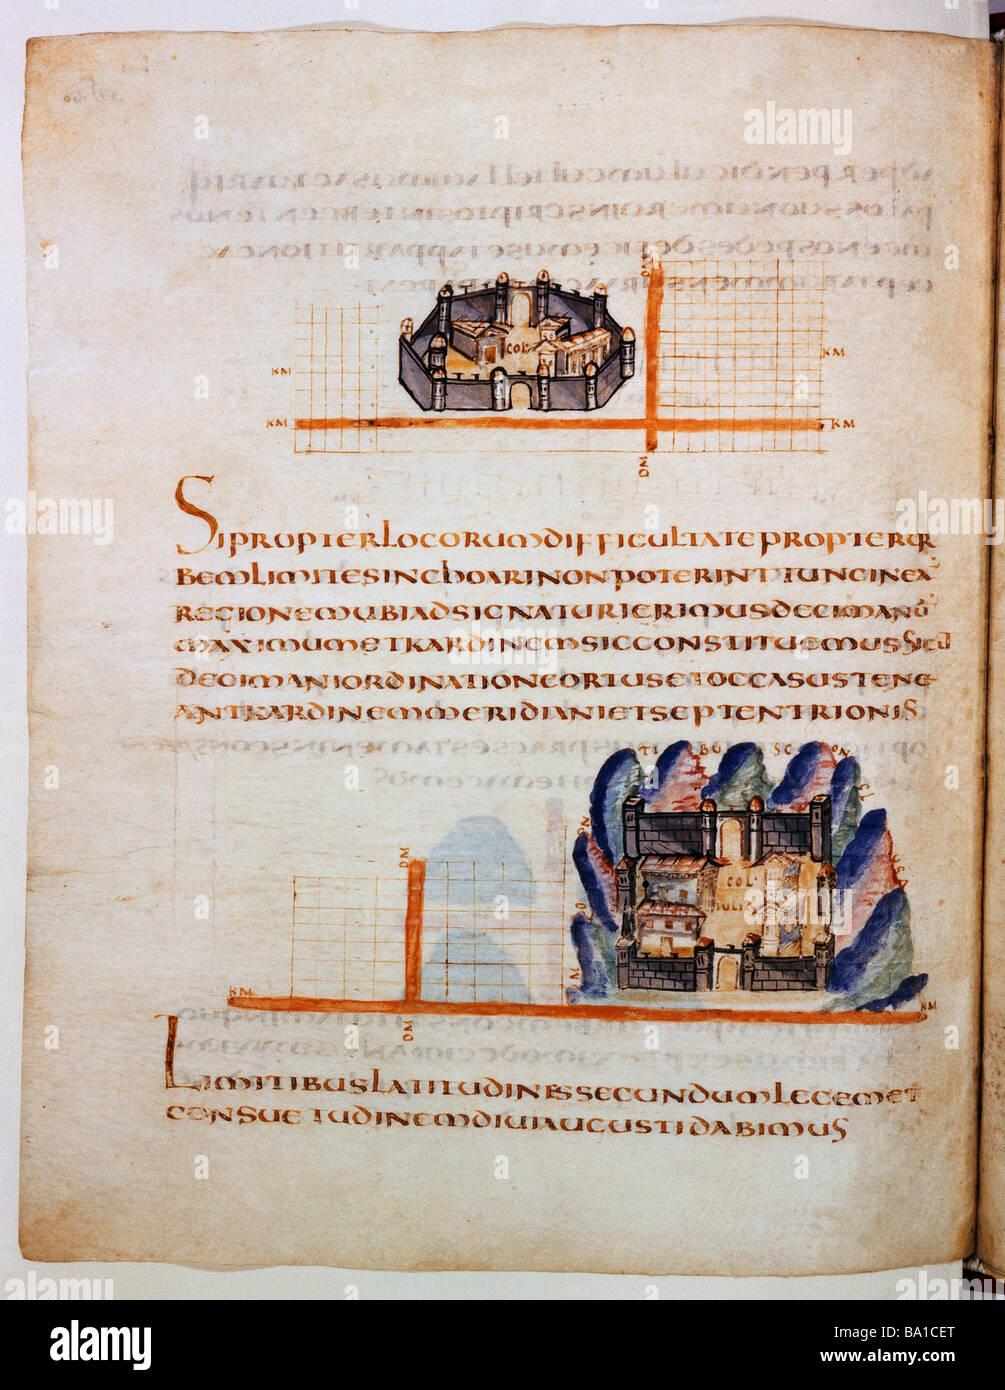 architecture, castles, city walls, illumination from 'Codex Guelf', Herzog August Bibliothek, Wolfenbuettel, - Stock Image